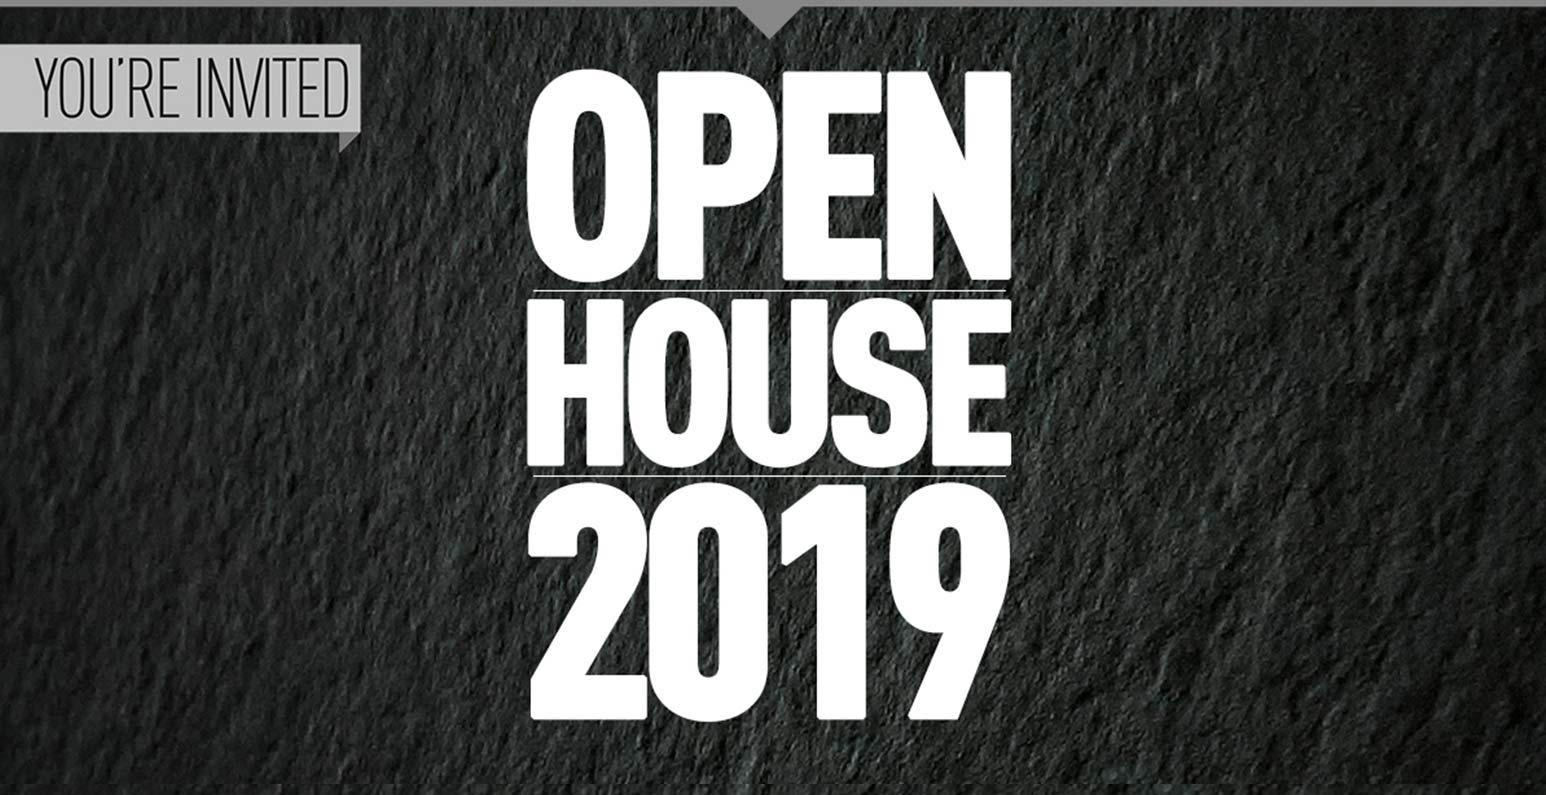 Open House 2019 CDK Stone Sydney Tools Equipment Machinery